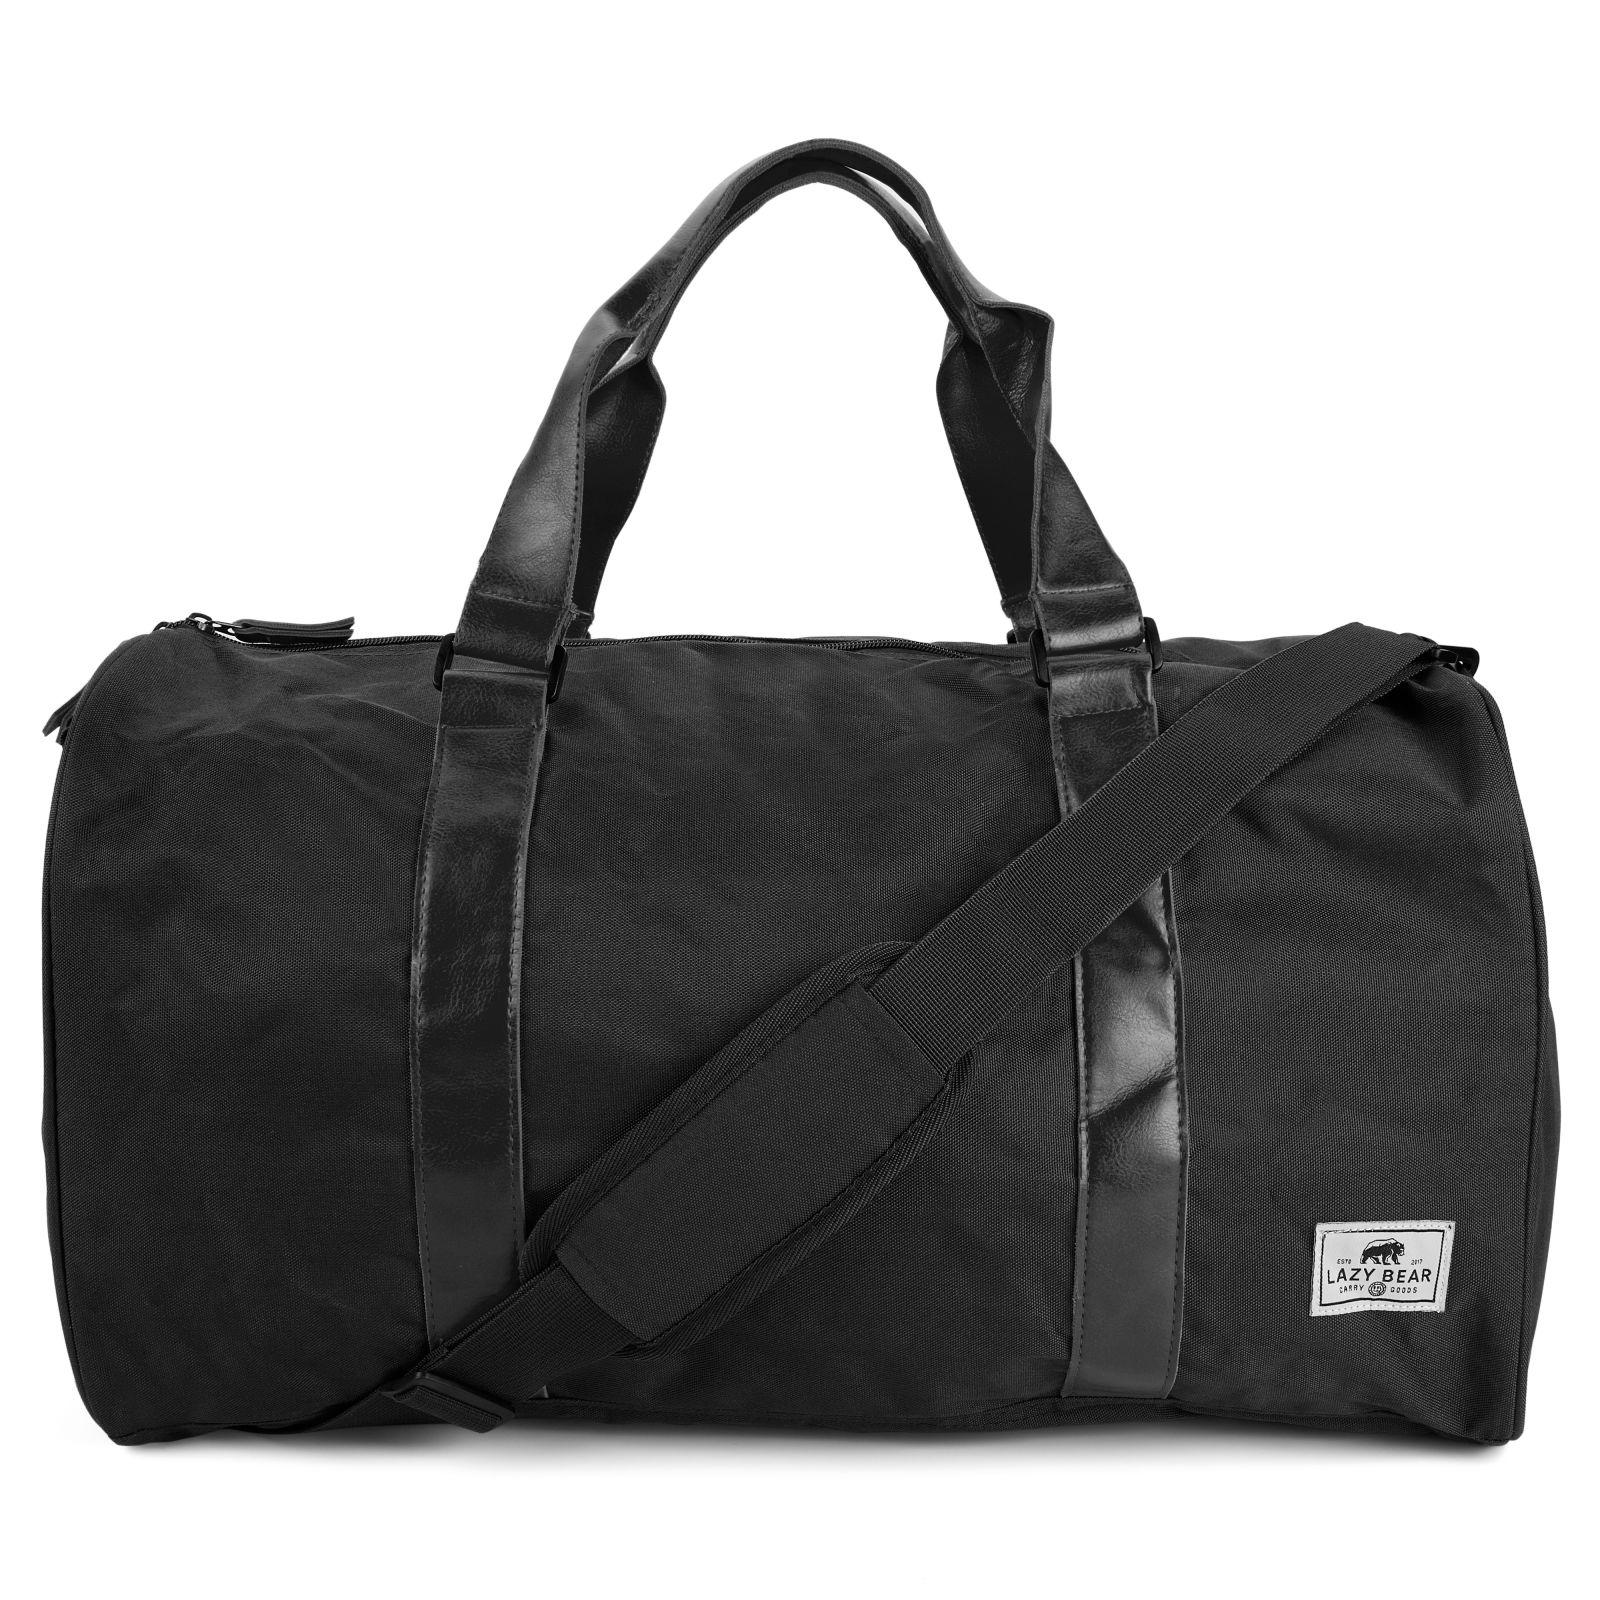 Sac Duffel Bag noir & brun California